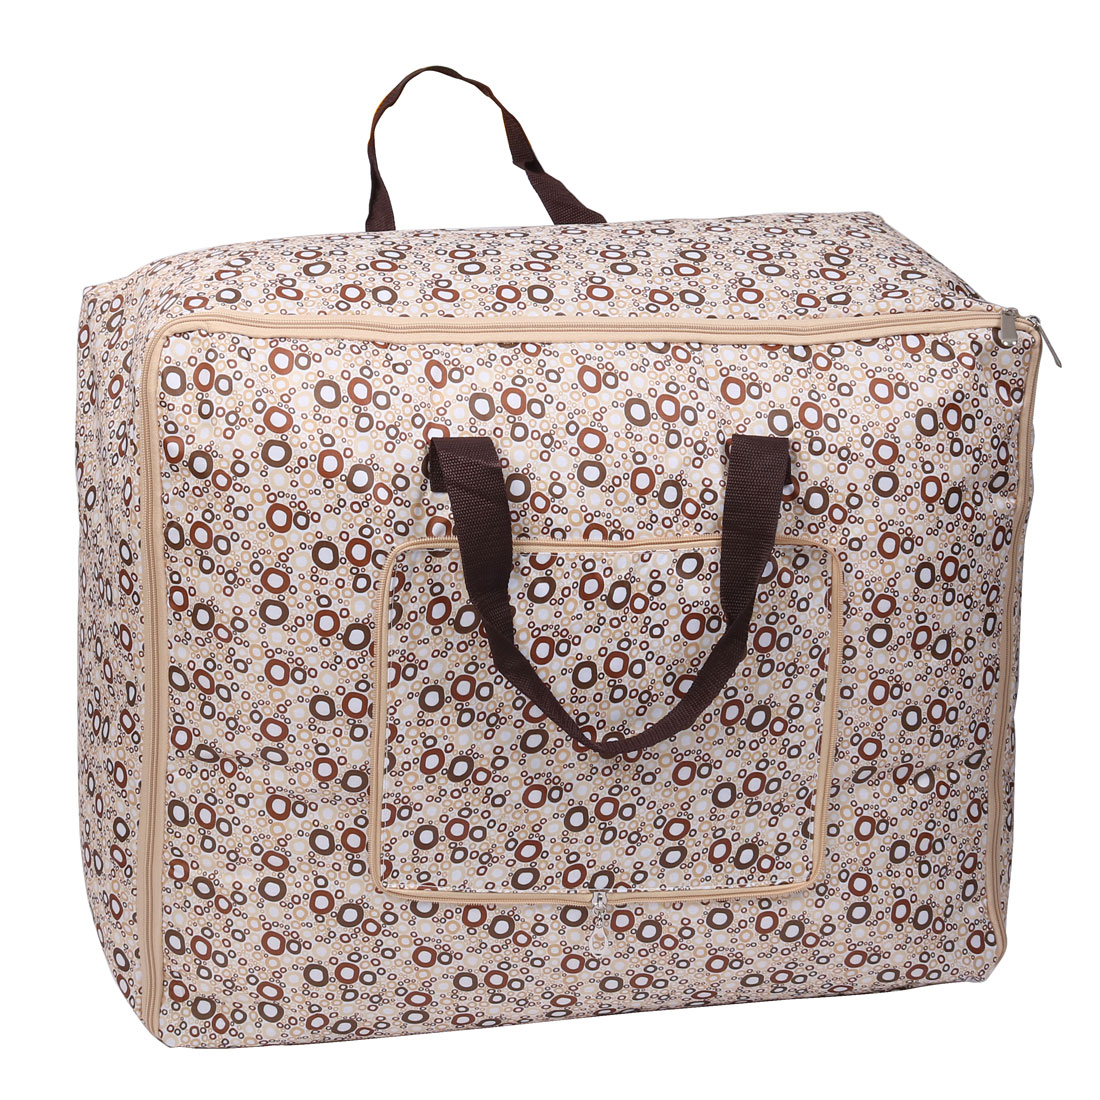 Circle Pattern Bed Sheets Quilt Duvet Storage Bag Beige Brown 55cm x 35cm